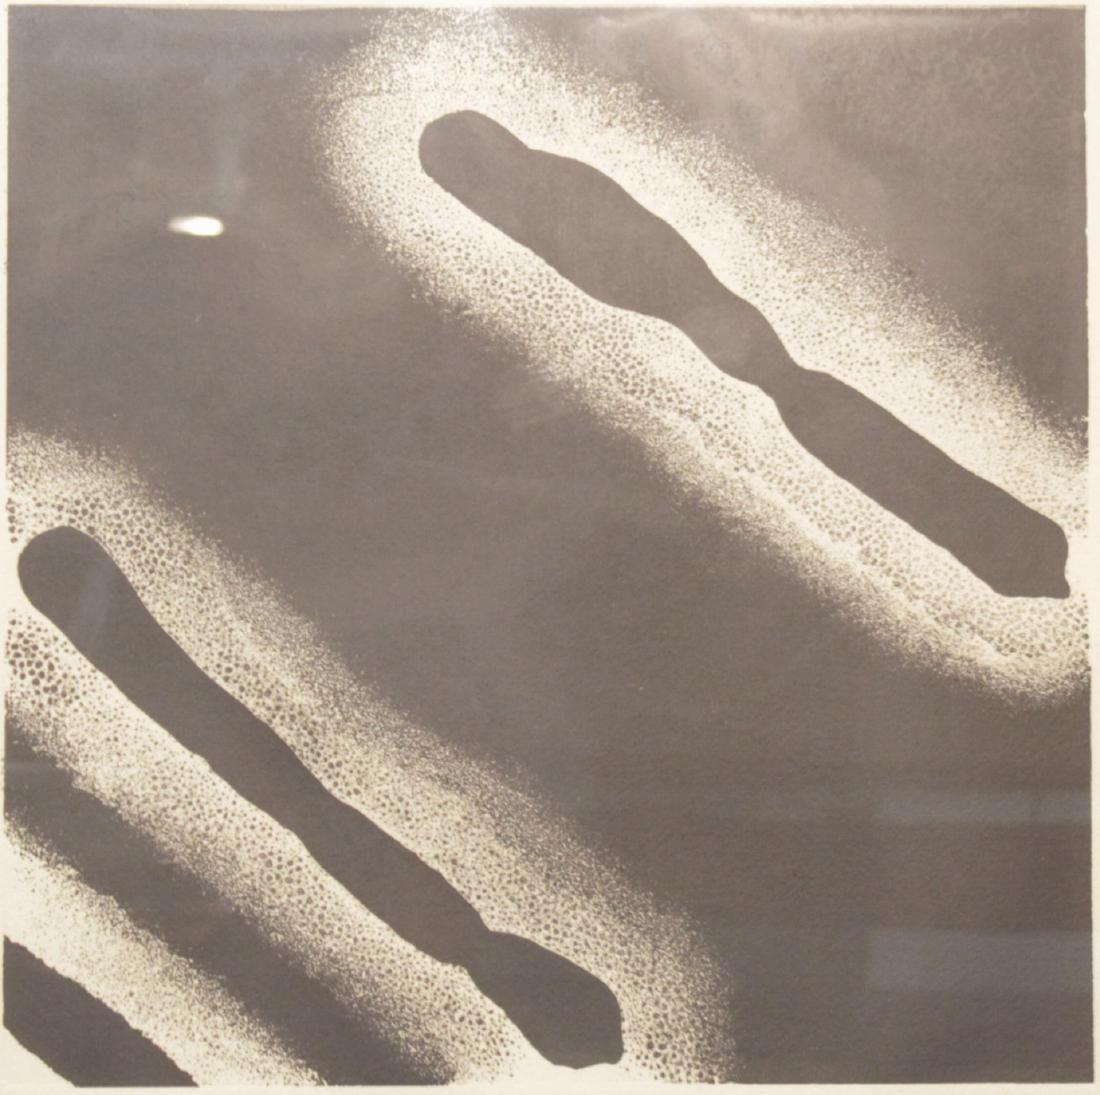 Michael Balog (American, 1944-1987)- Lithograph